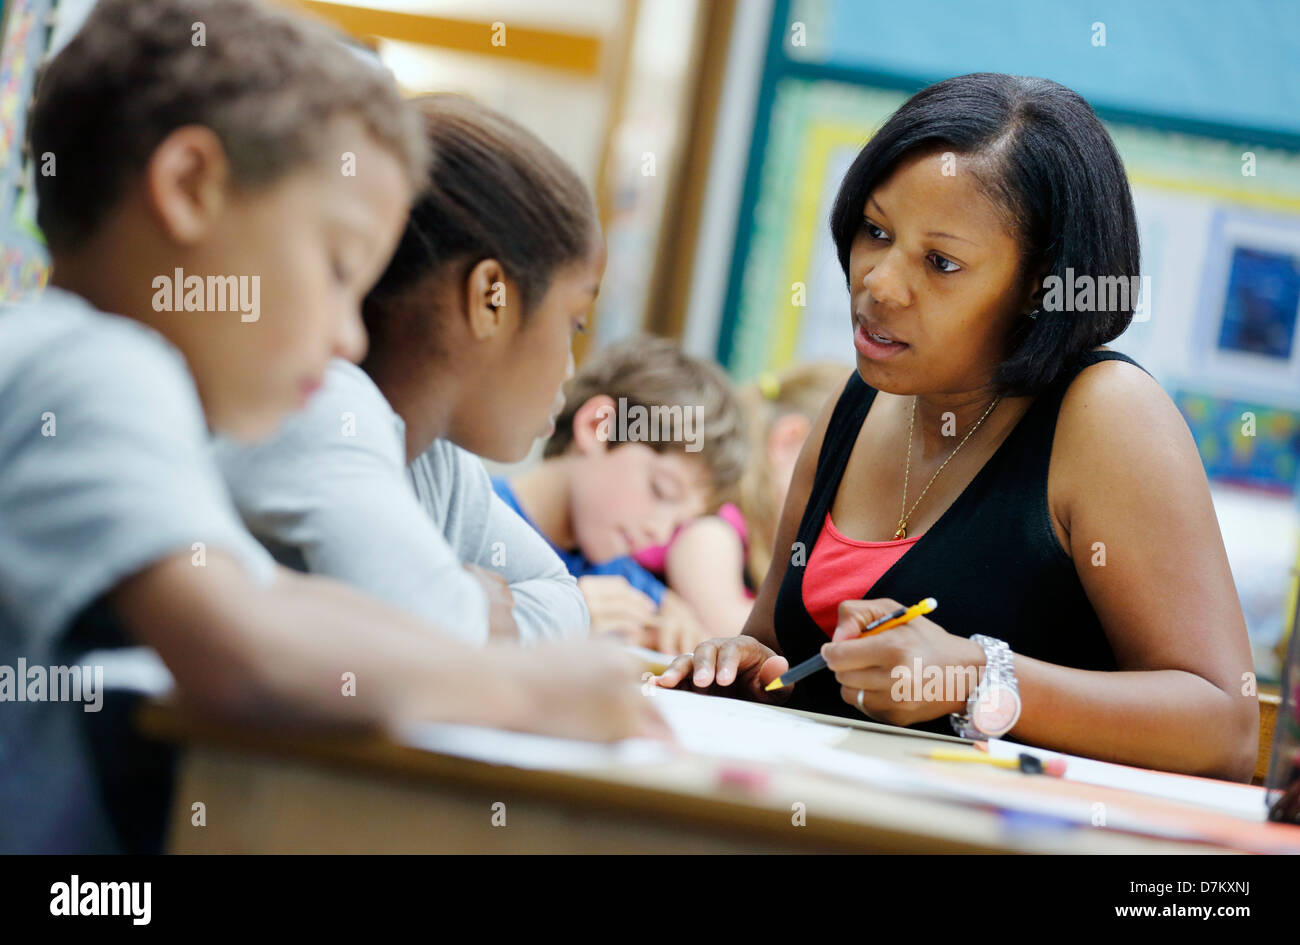 Elementary school teacher Photo Stock